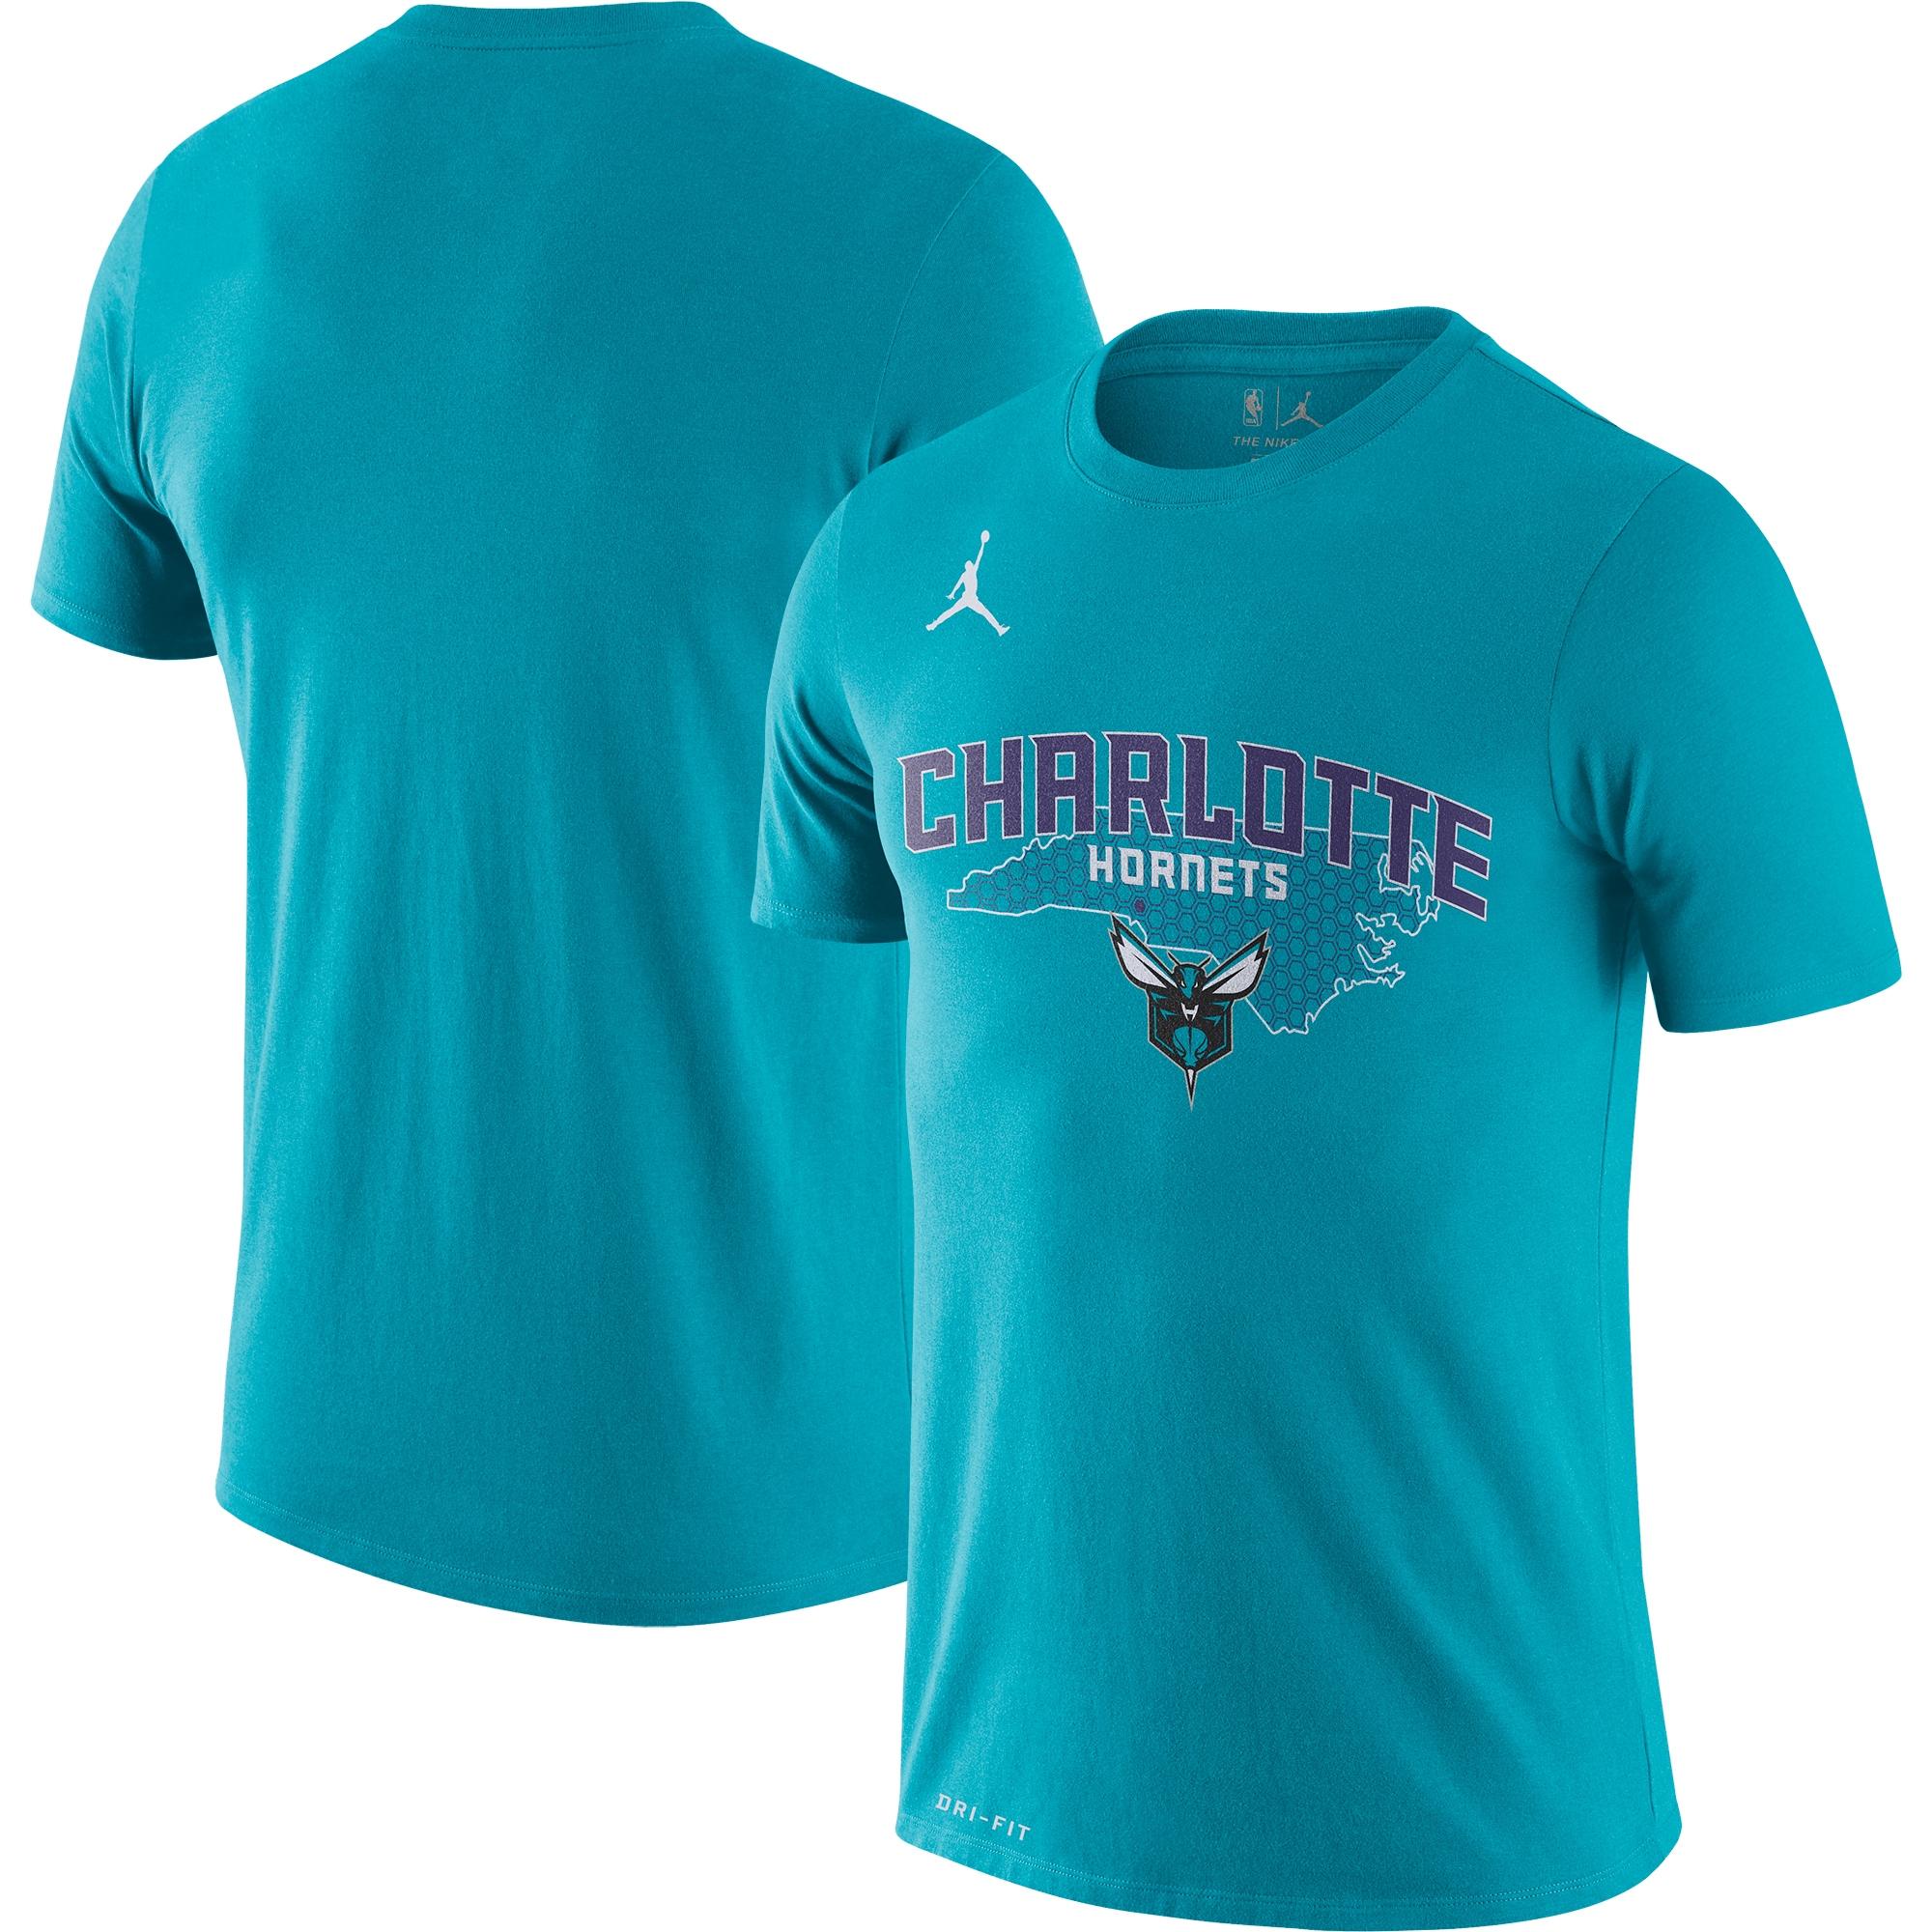 Charlotte Hornets Jordan Brand 2019/20 City Edition Hometown Performance T-Shirt - Teal